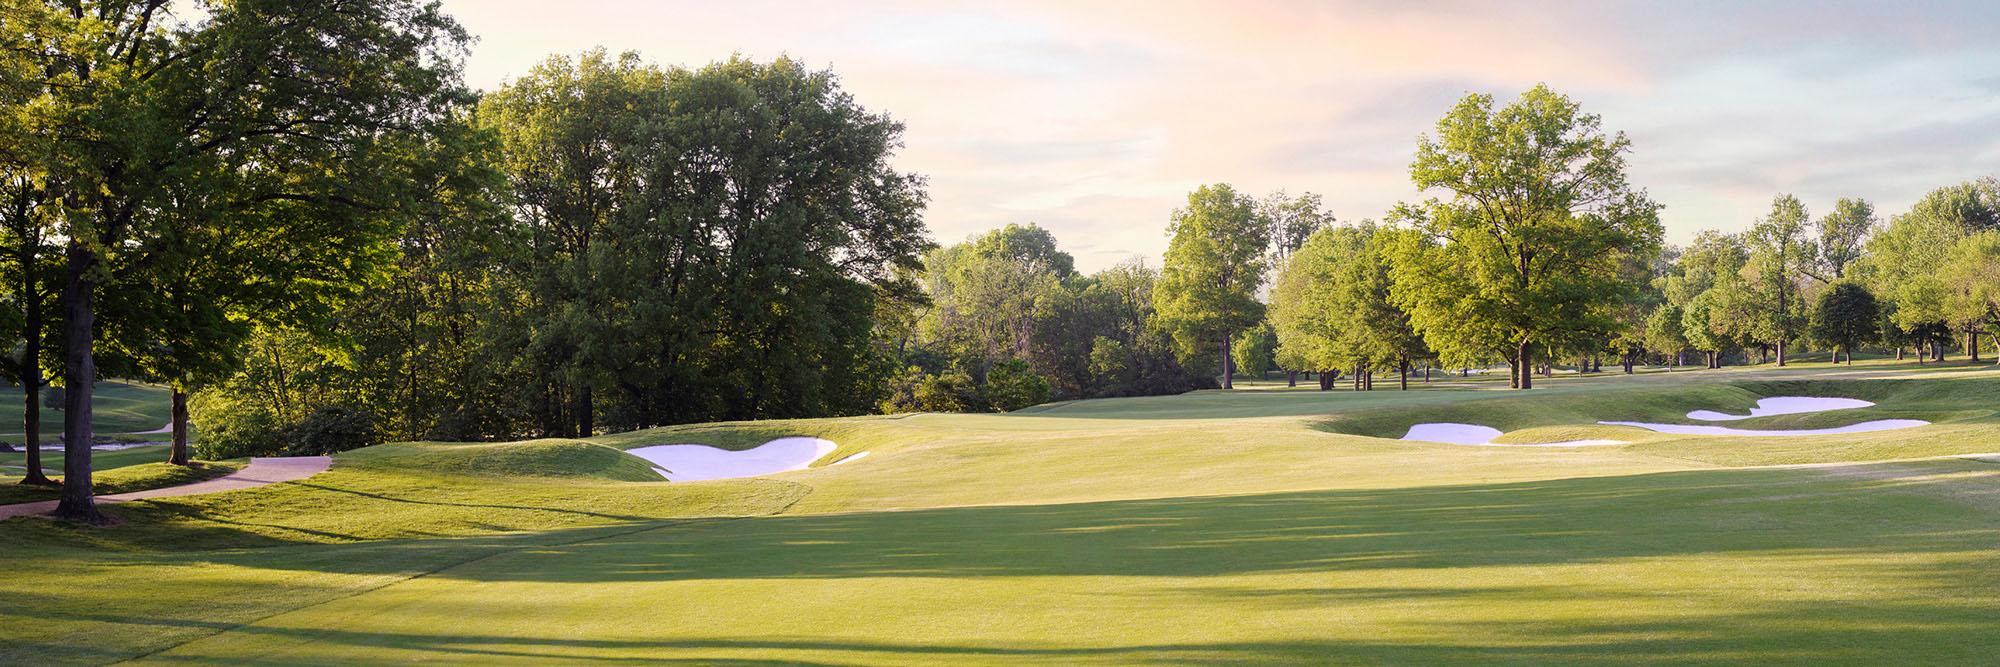 Golf Course Image - Bellerive No. 18